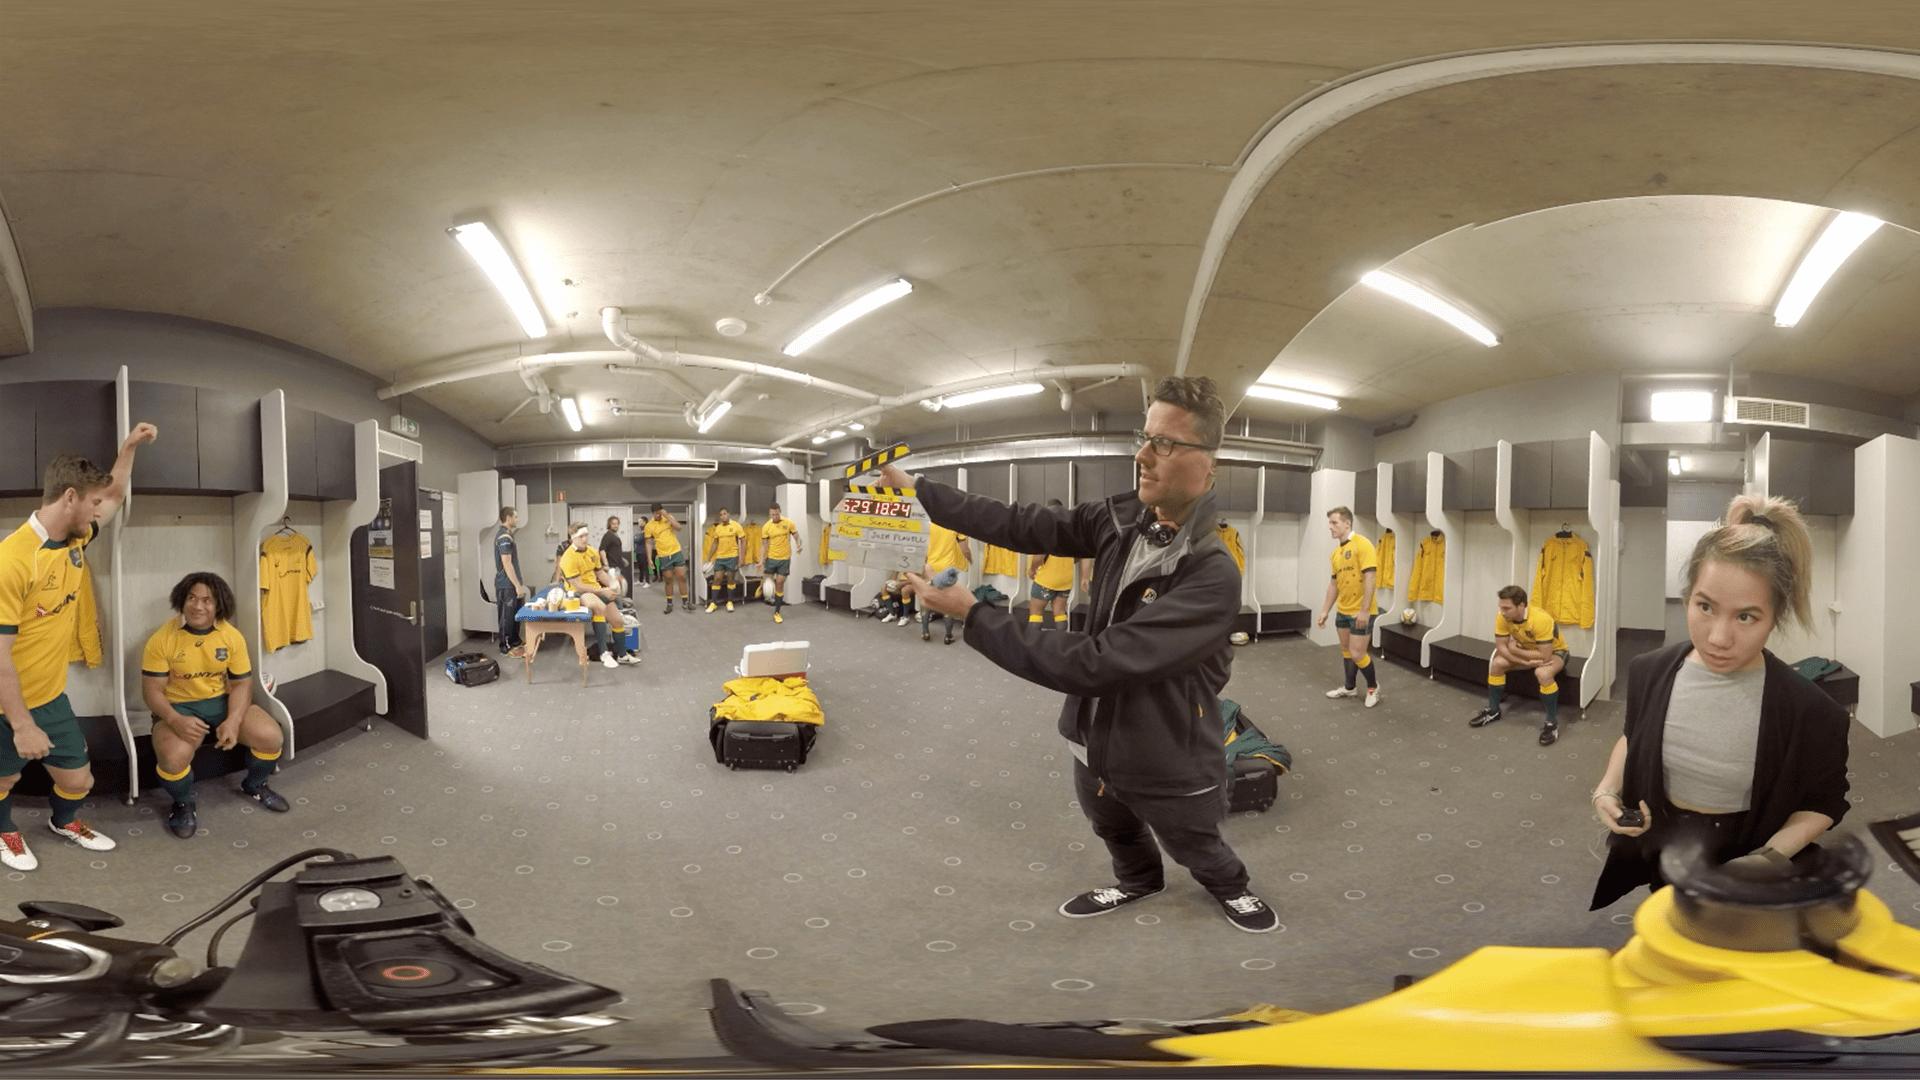 HSBC Wallabies Locker Room Scene in Virtual Reality